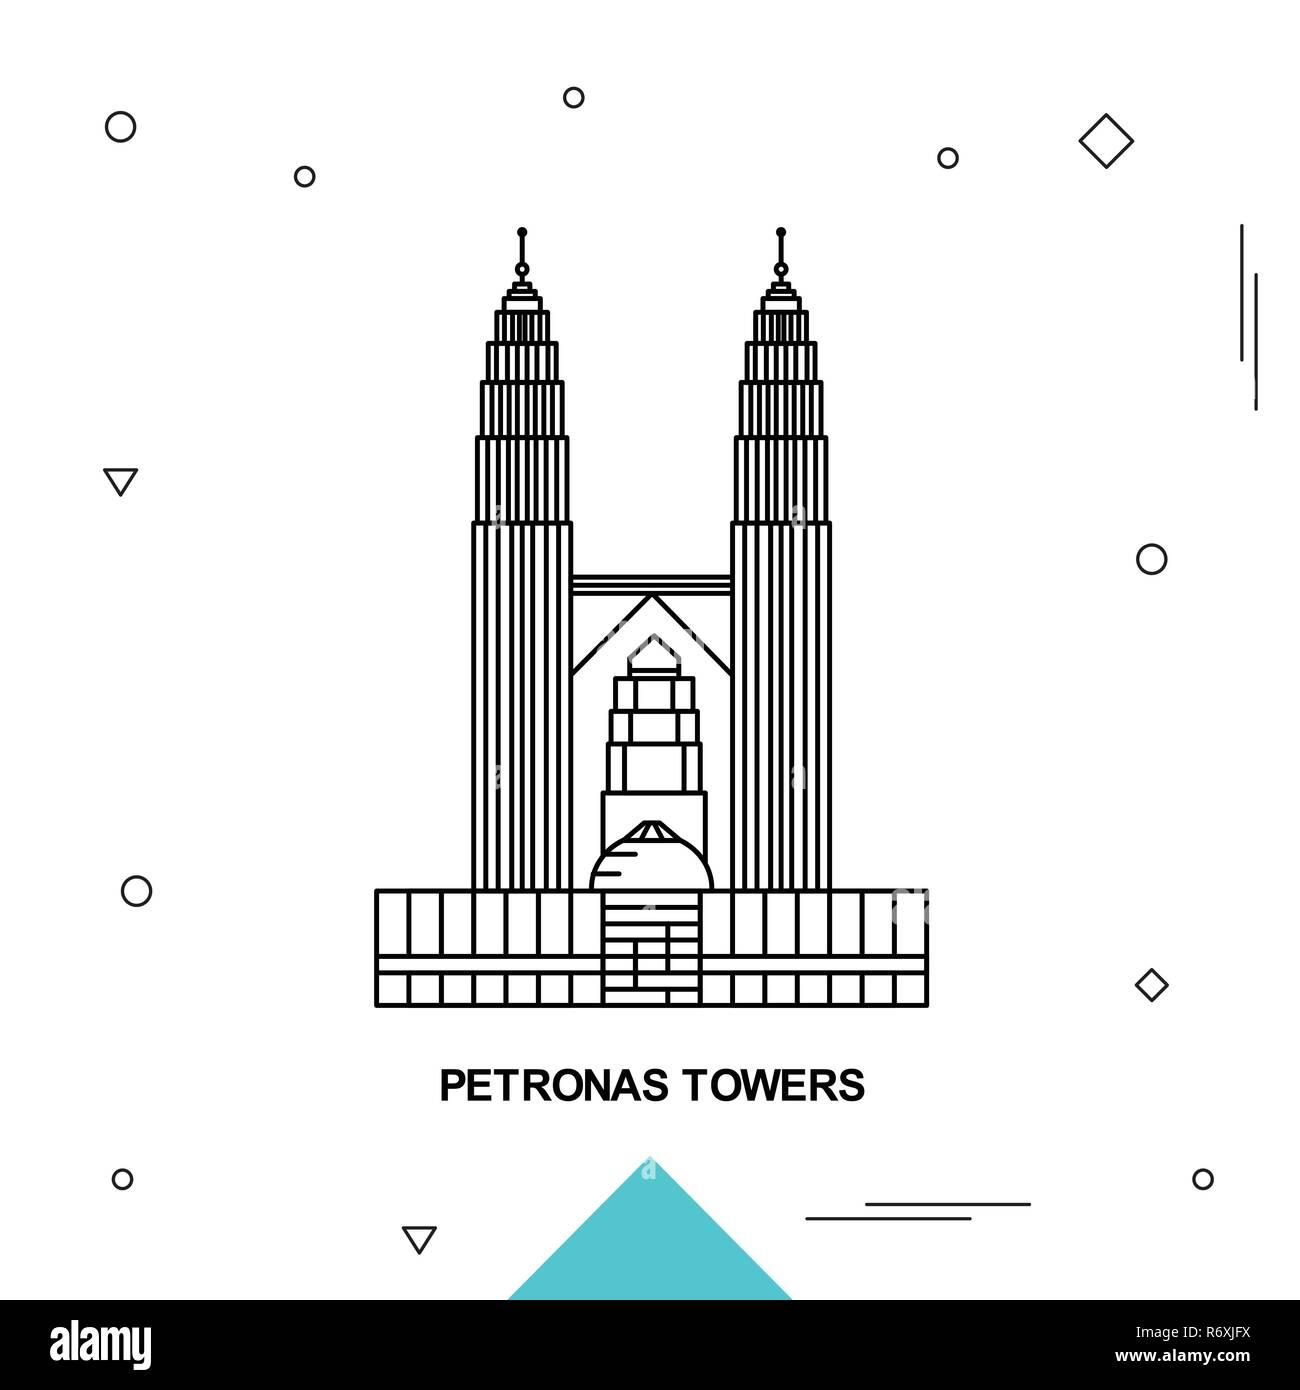 PETRONAS TOWERS - Stock Vector